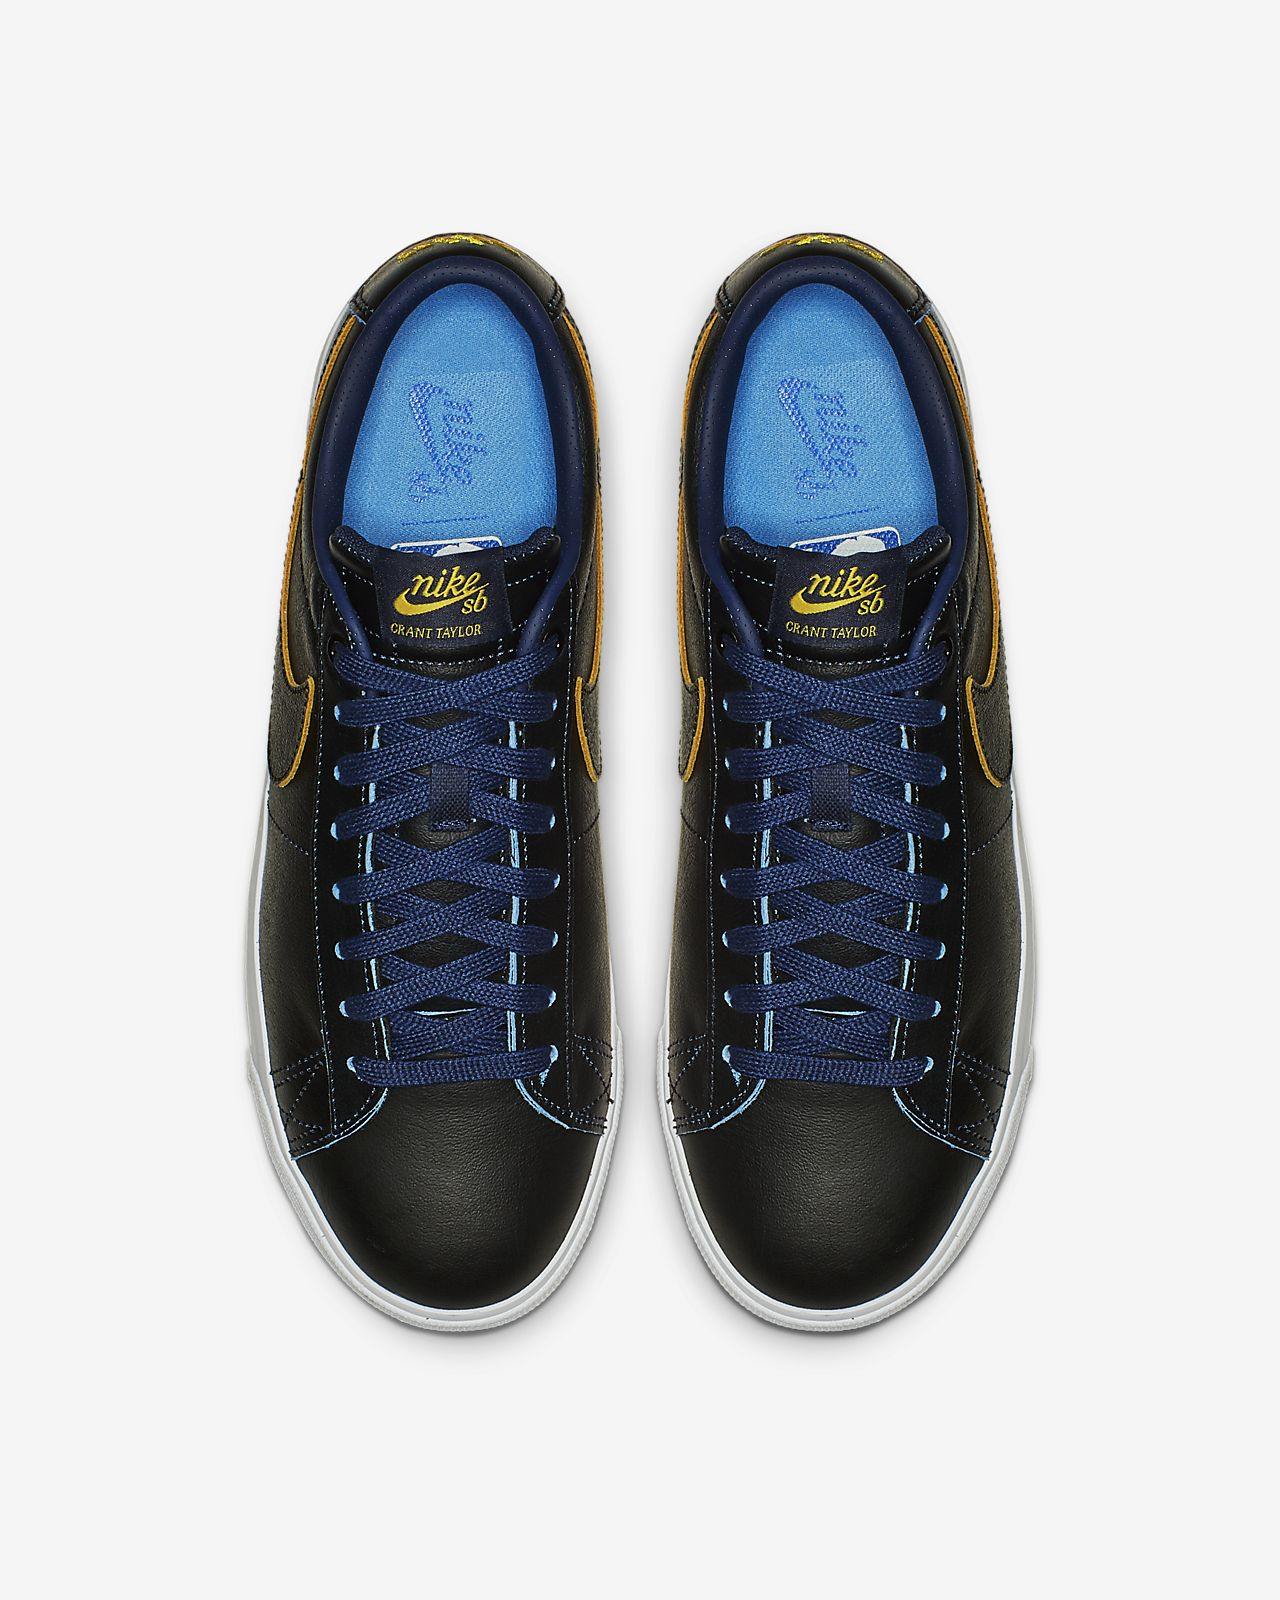 huge discount c60cf e6dc6 ... Nike SB Blazer Low GT NBA Men s Skate Shoe